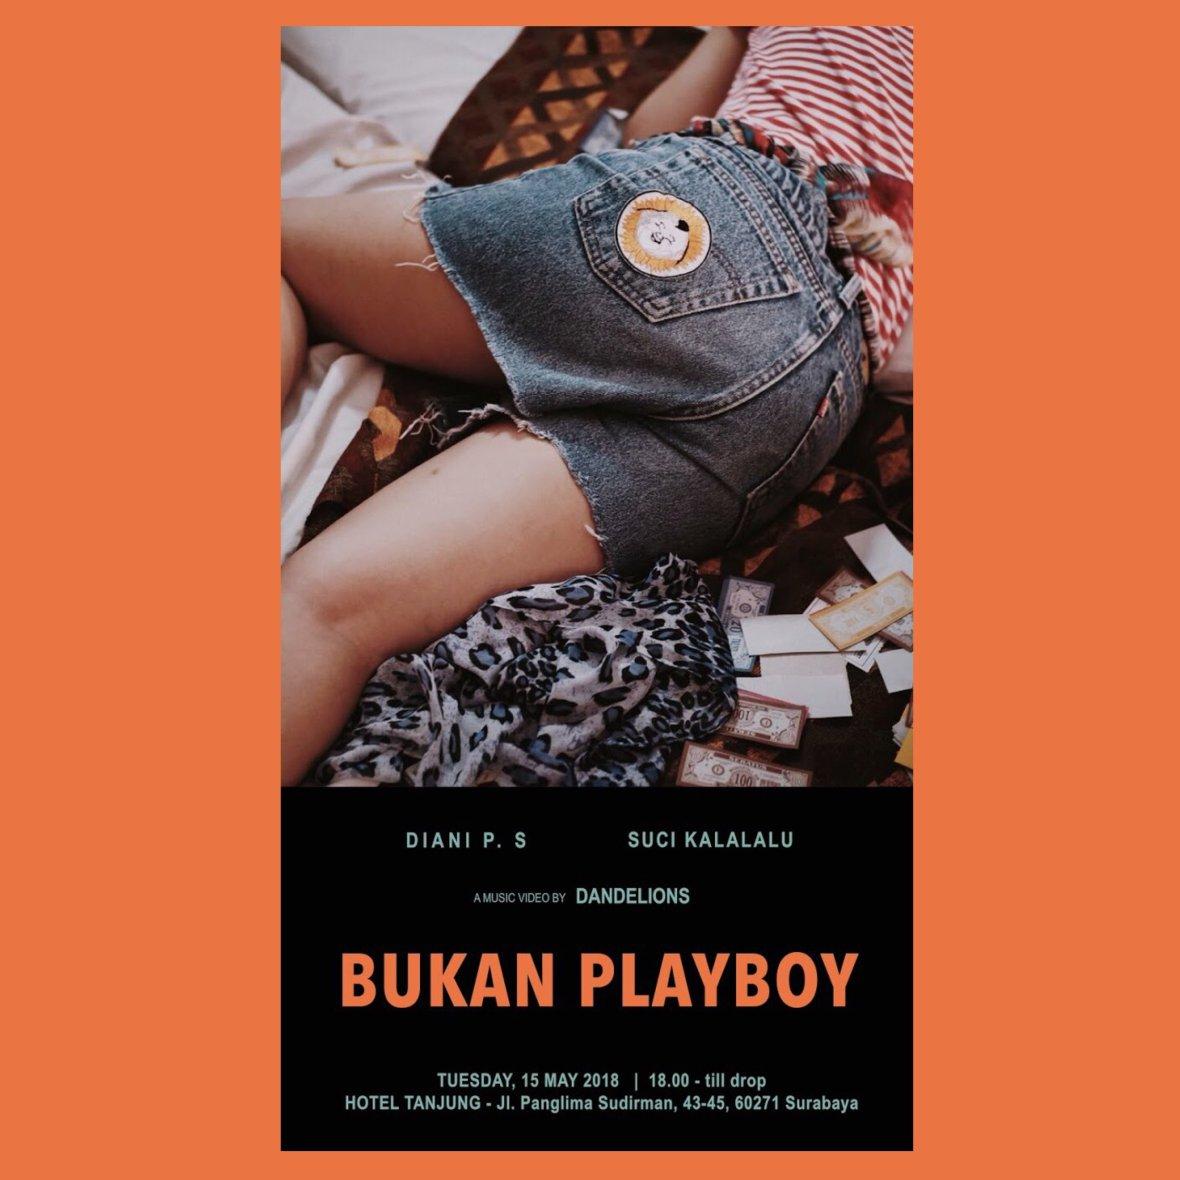 Dandelions Bukan Playboy download